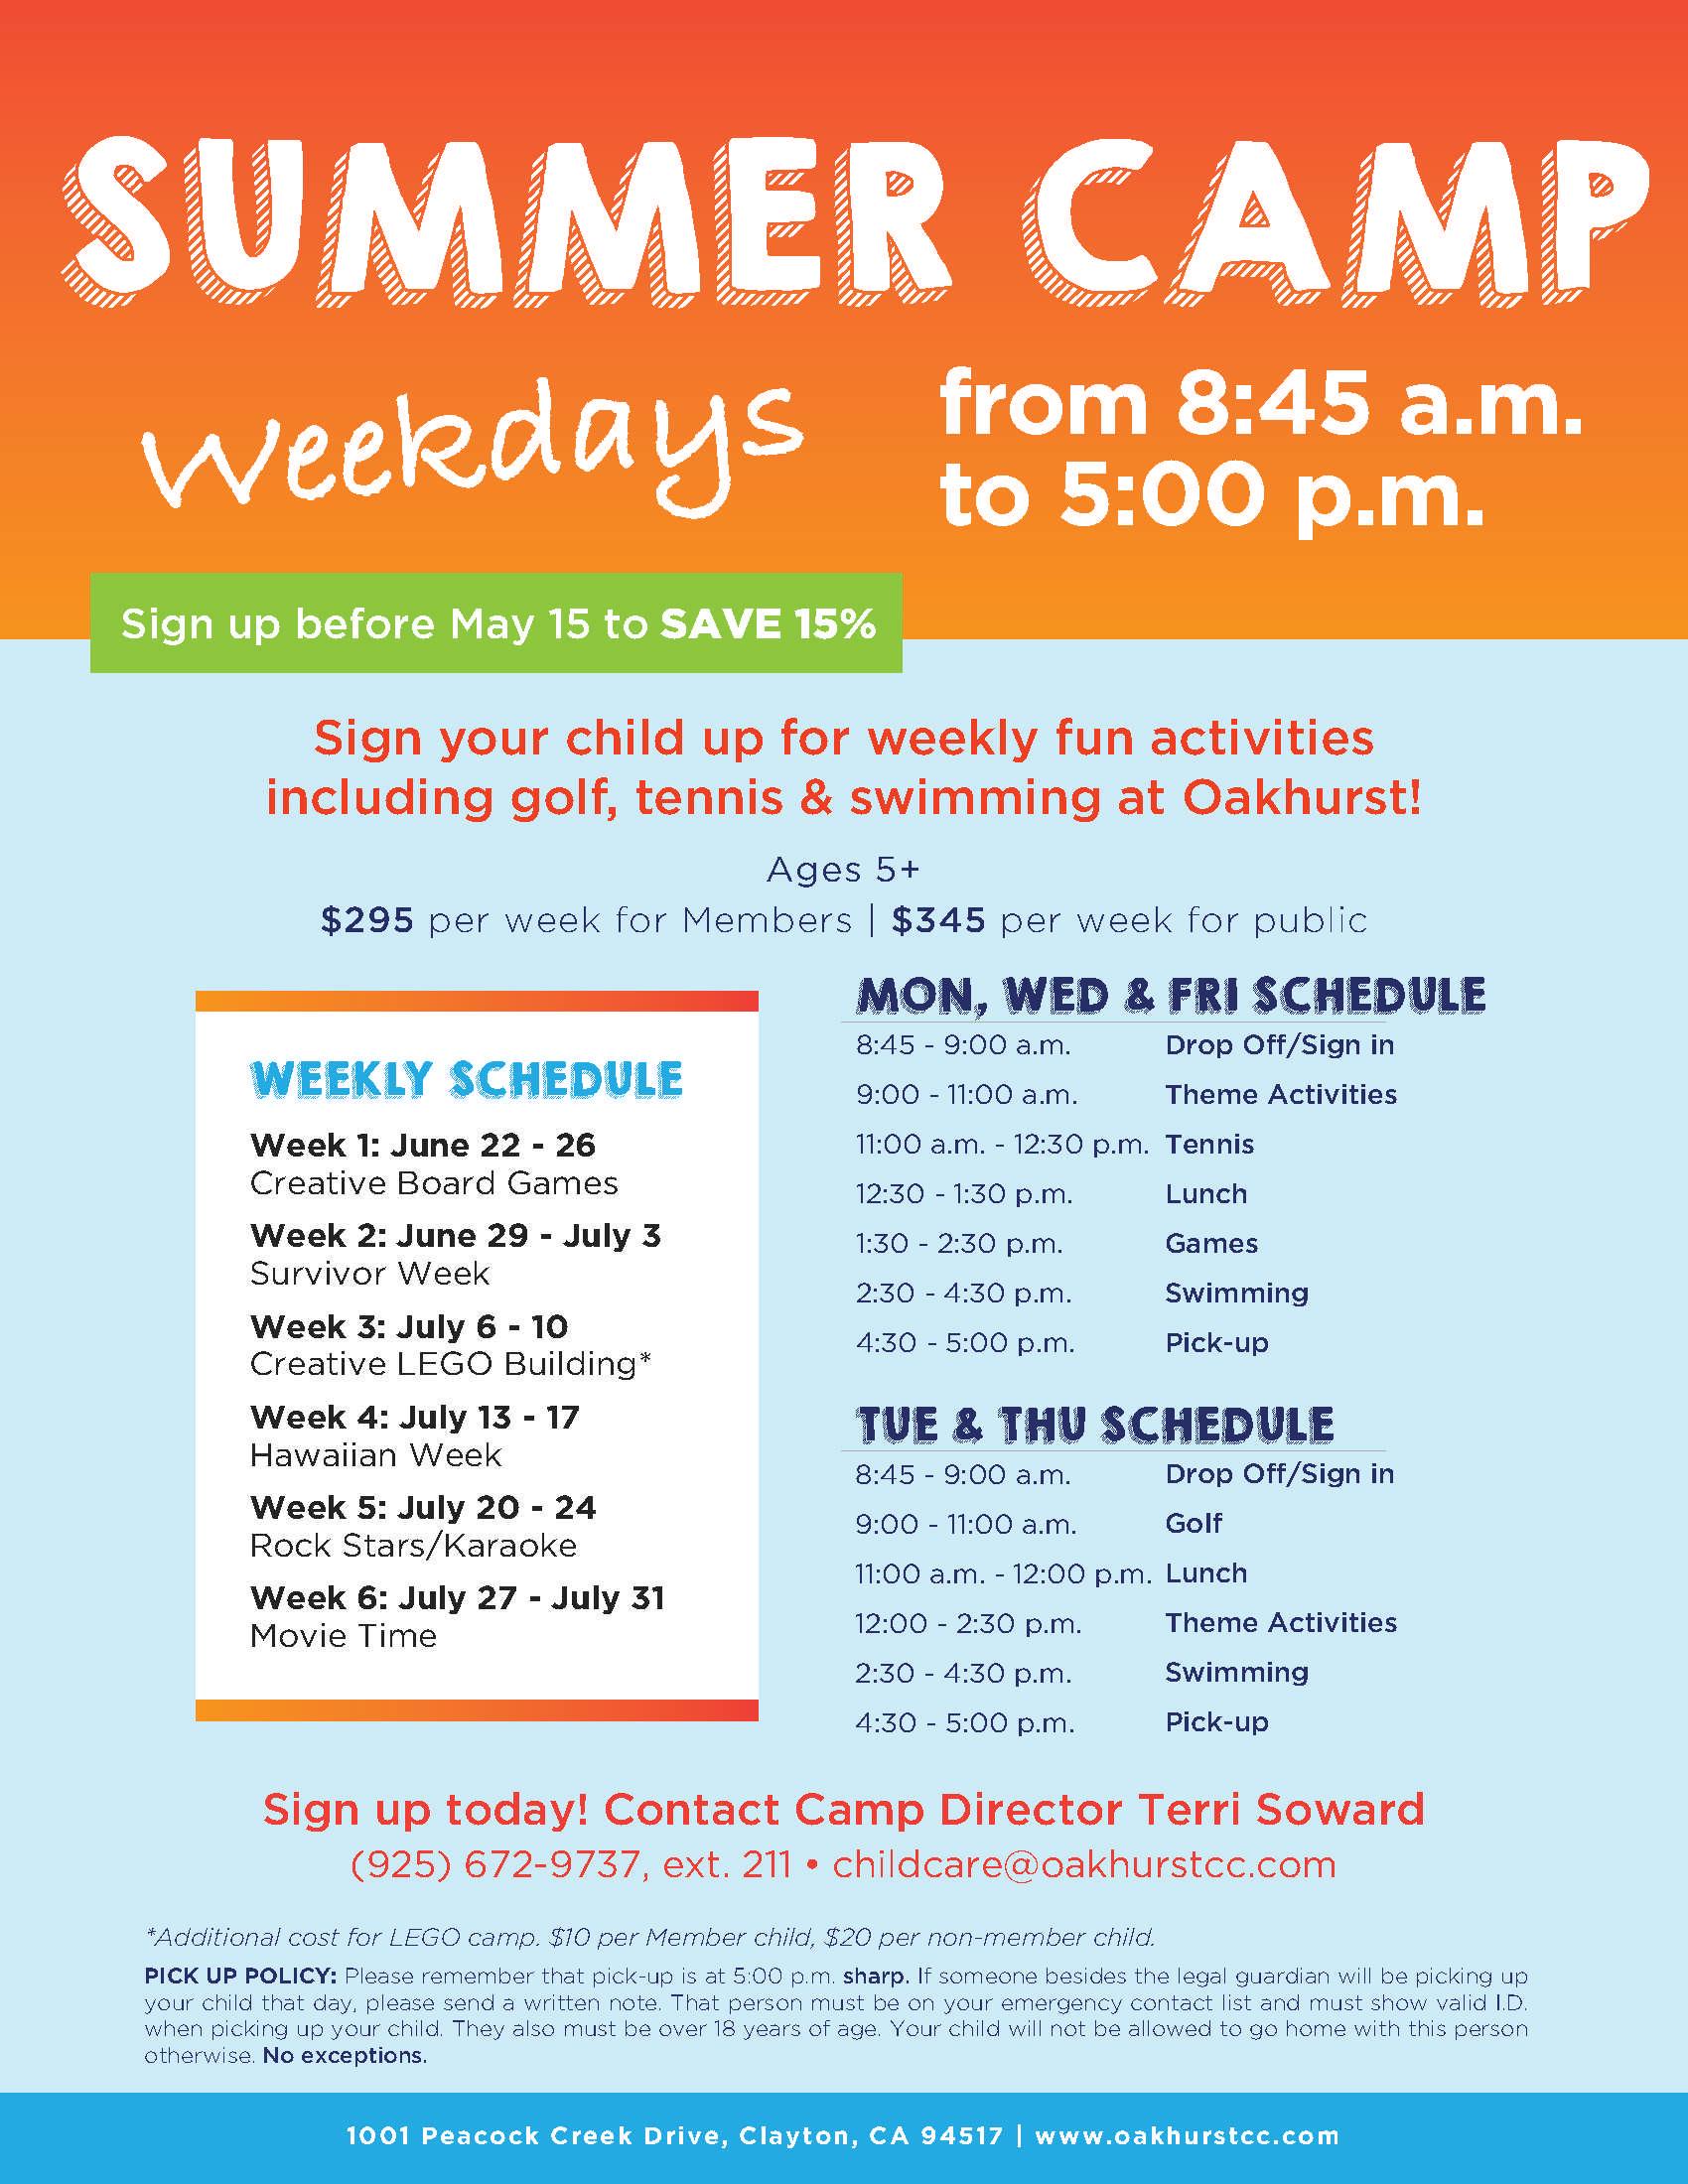 Oakhurst Summer Camp Flyer Template | Free Brochure Template